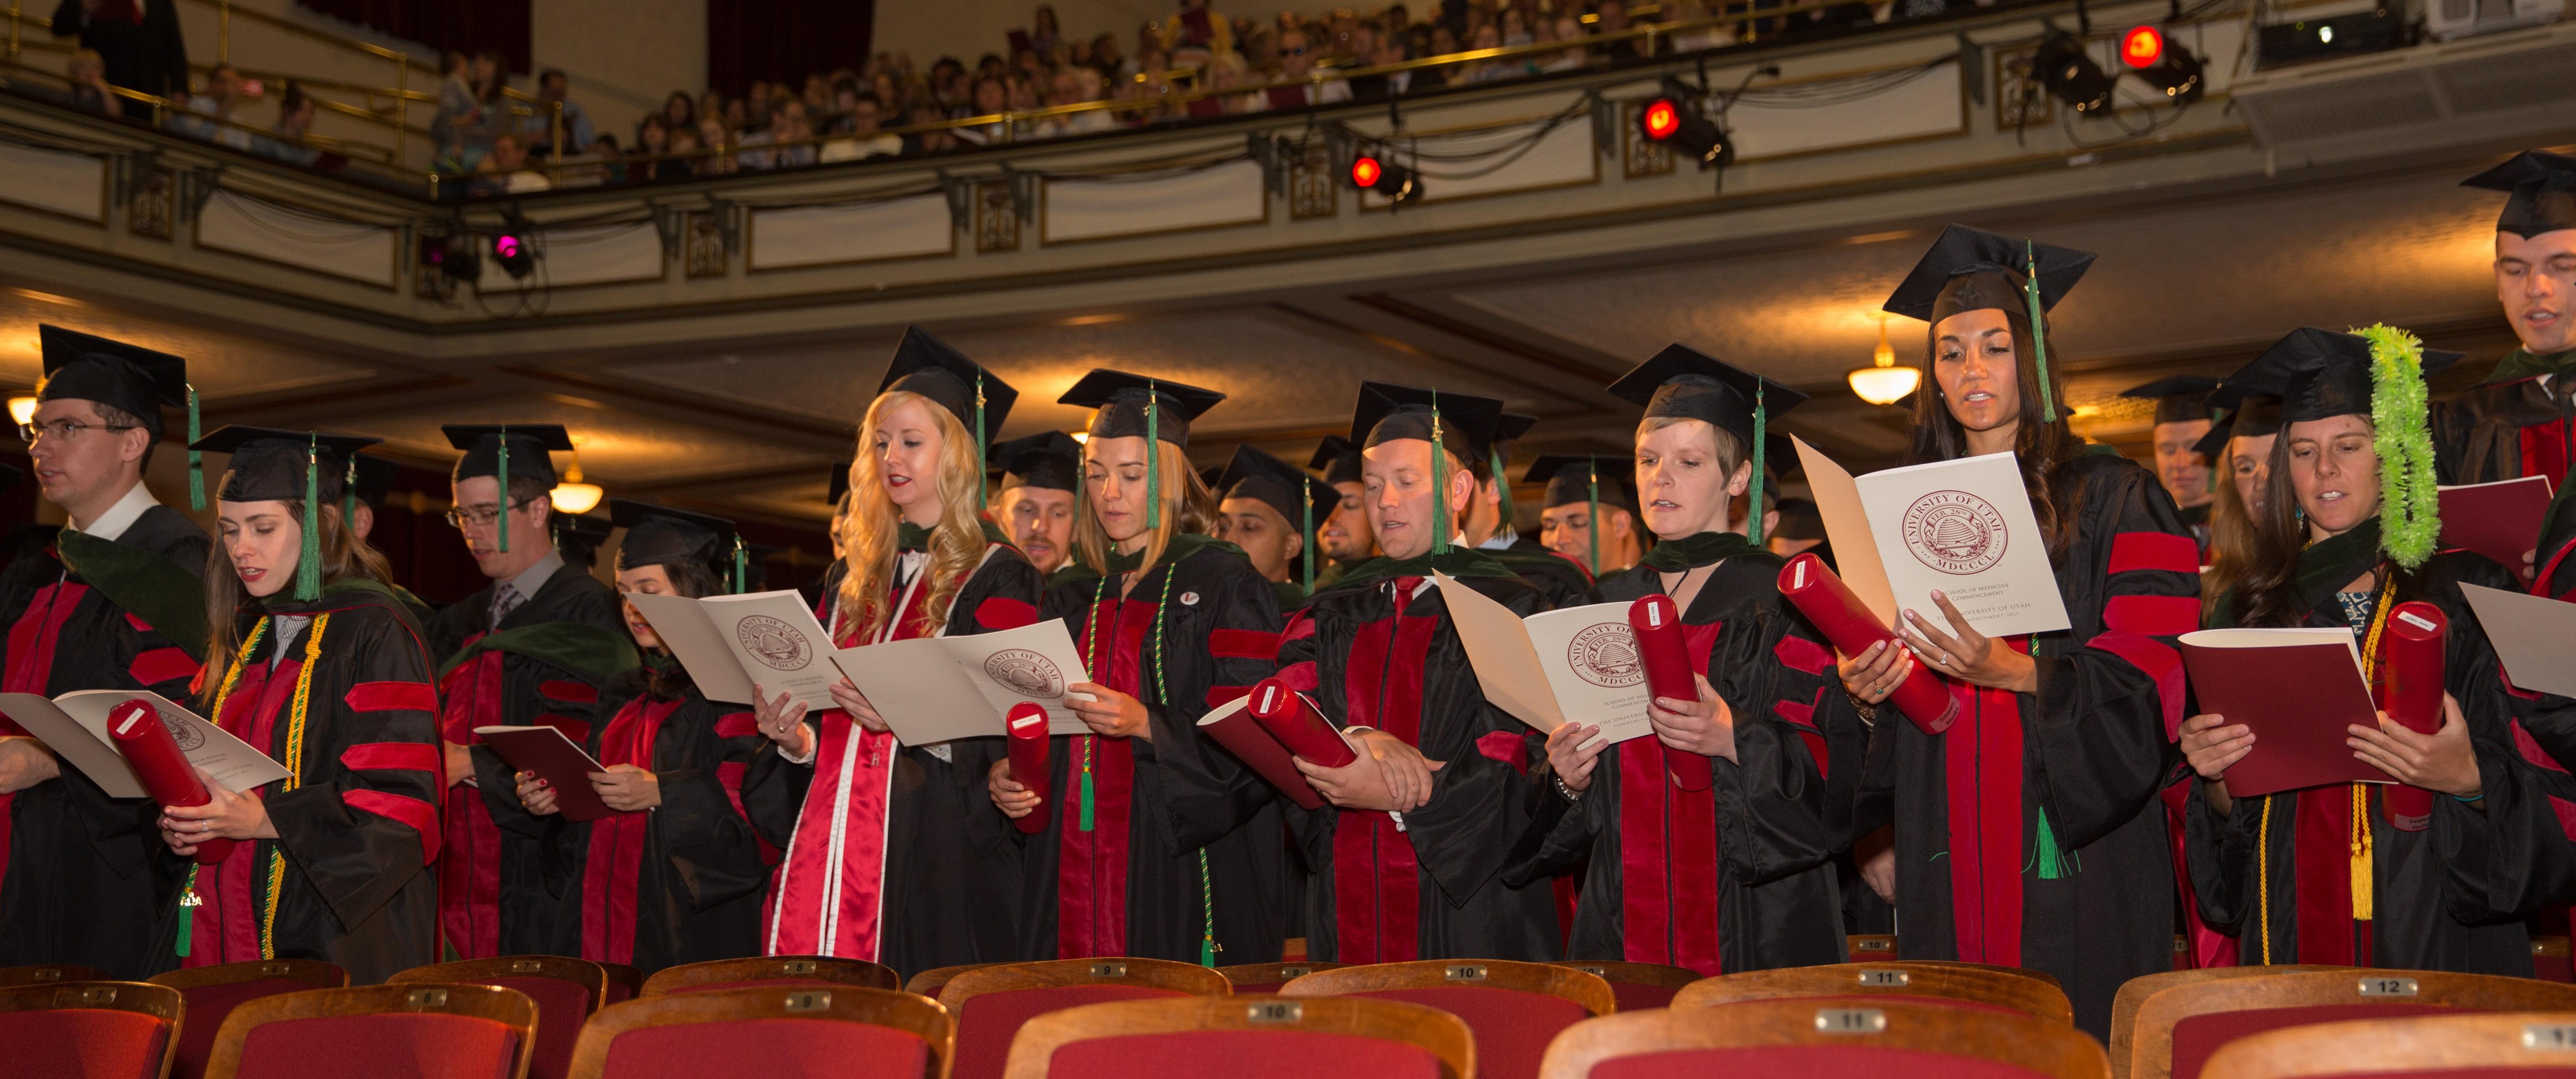 University of Utah School of Medicine   LinkedIn